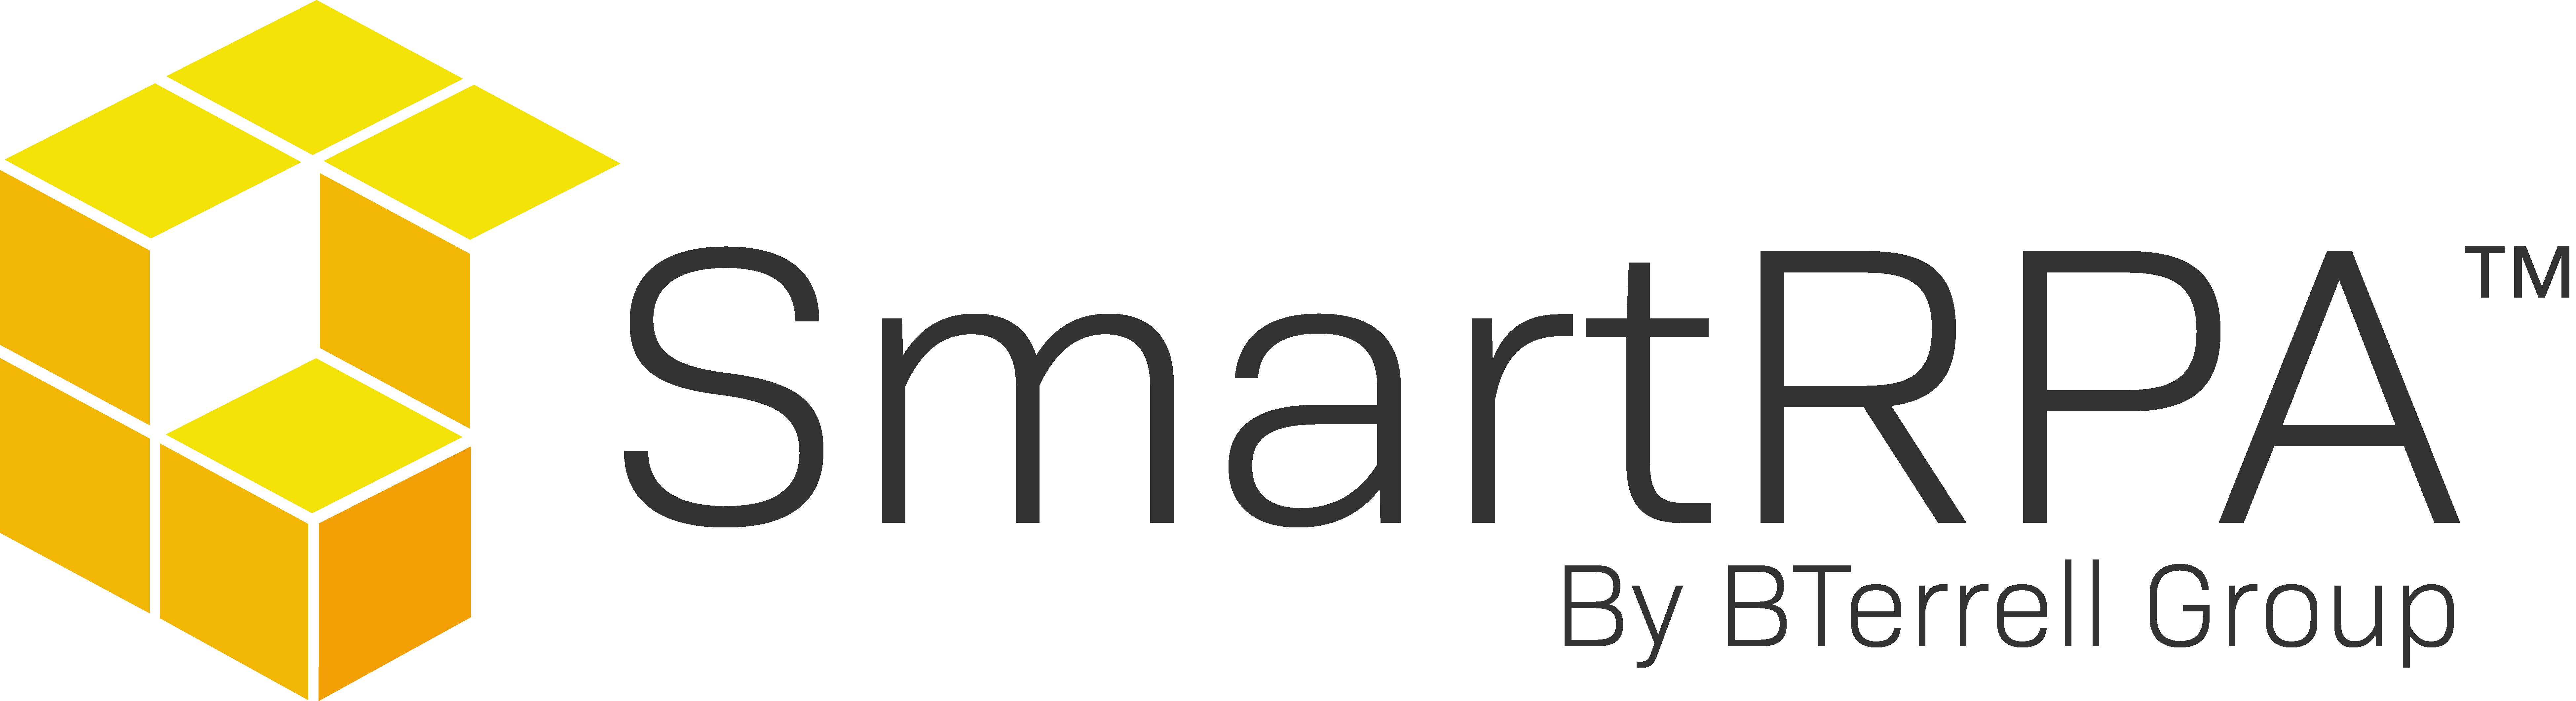 BT_SmartRPA logo_20210114